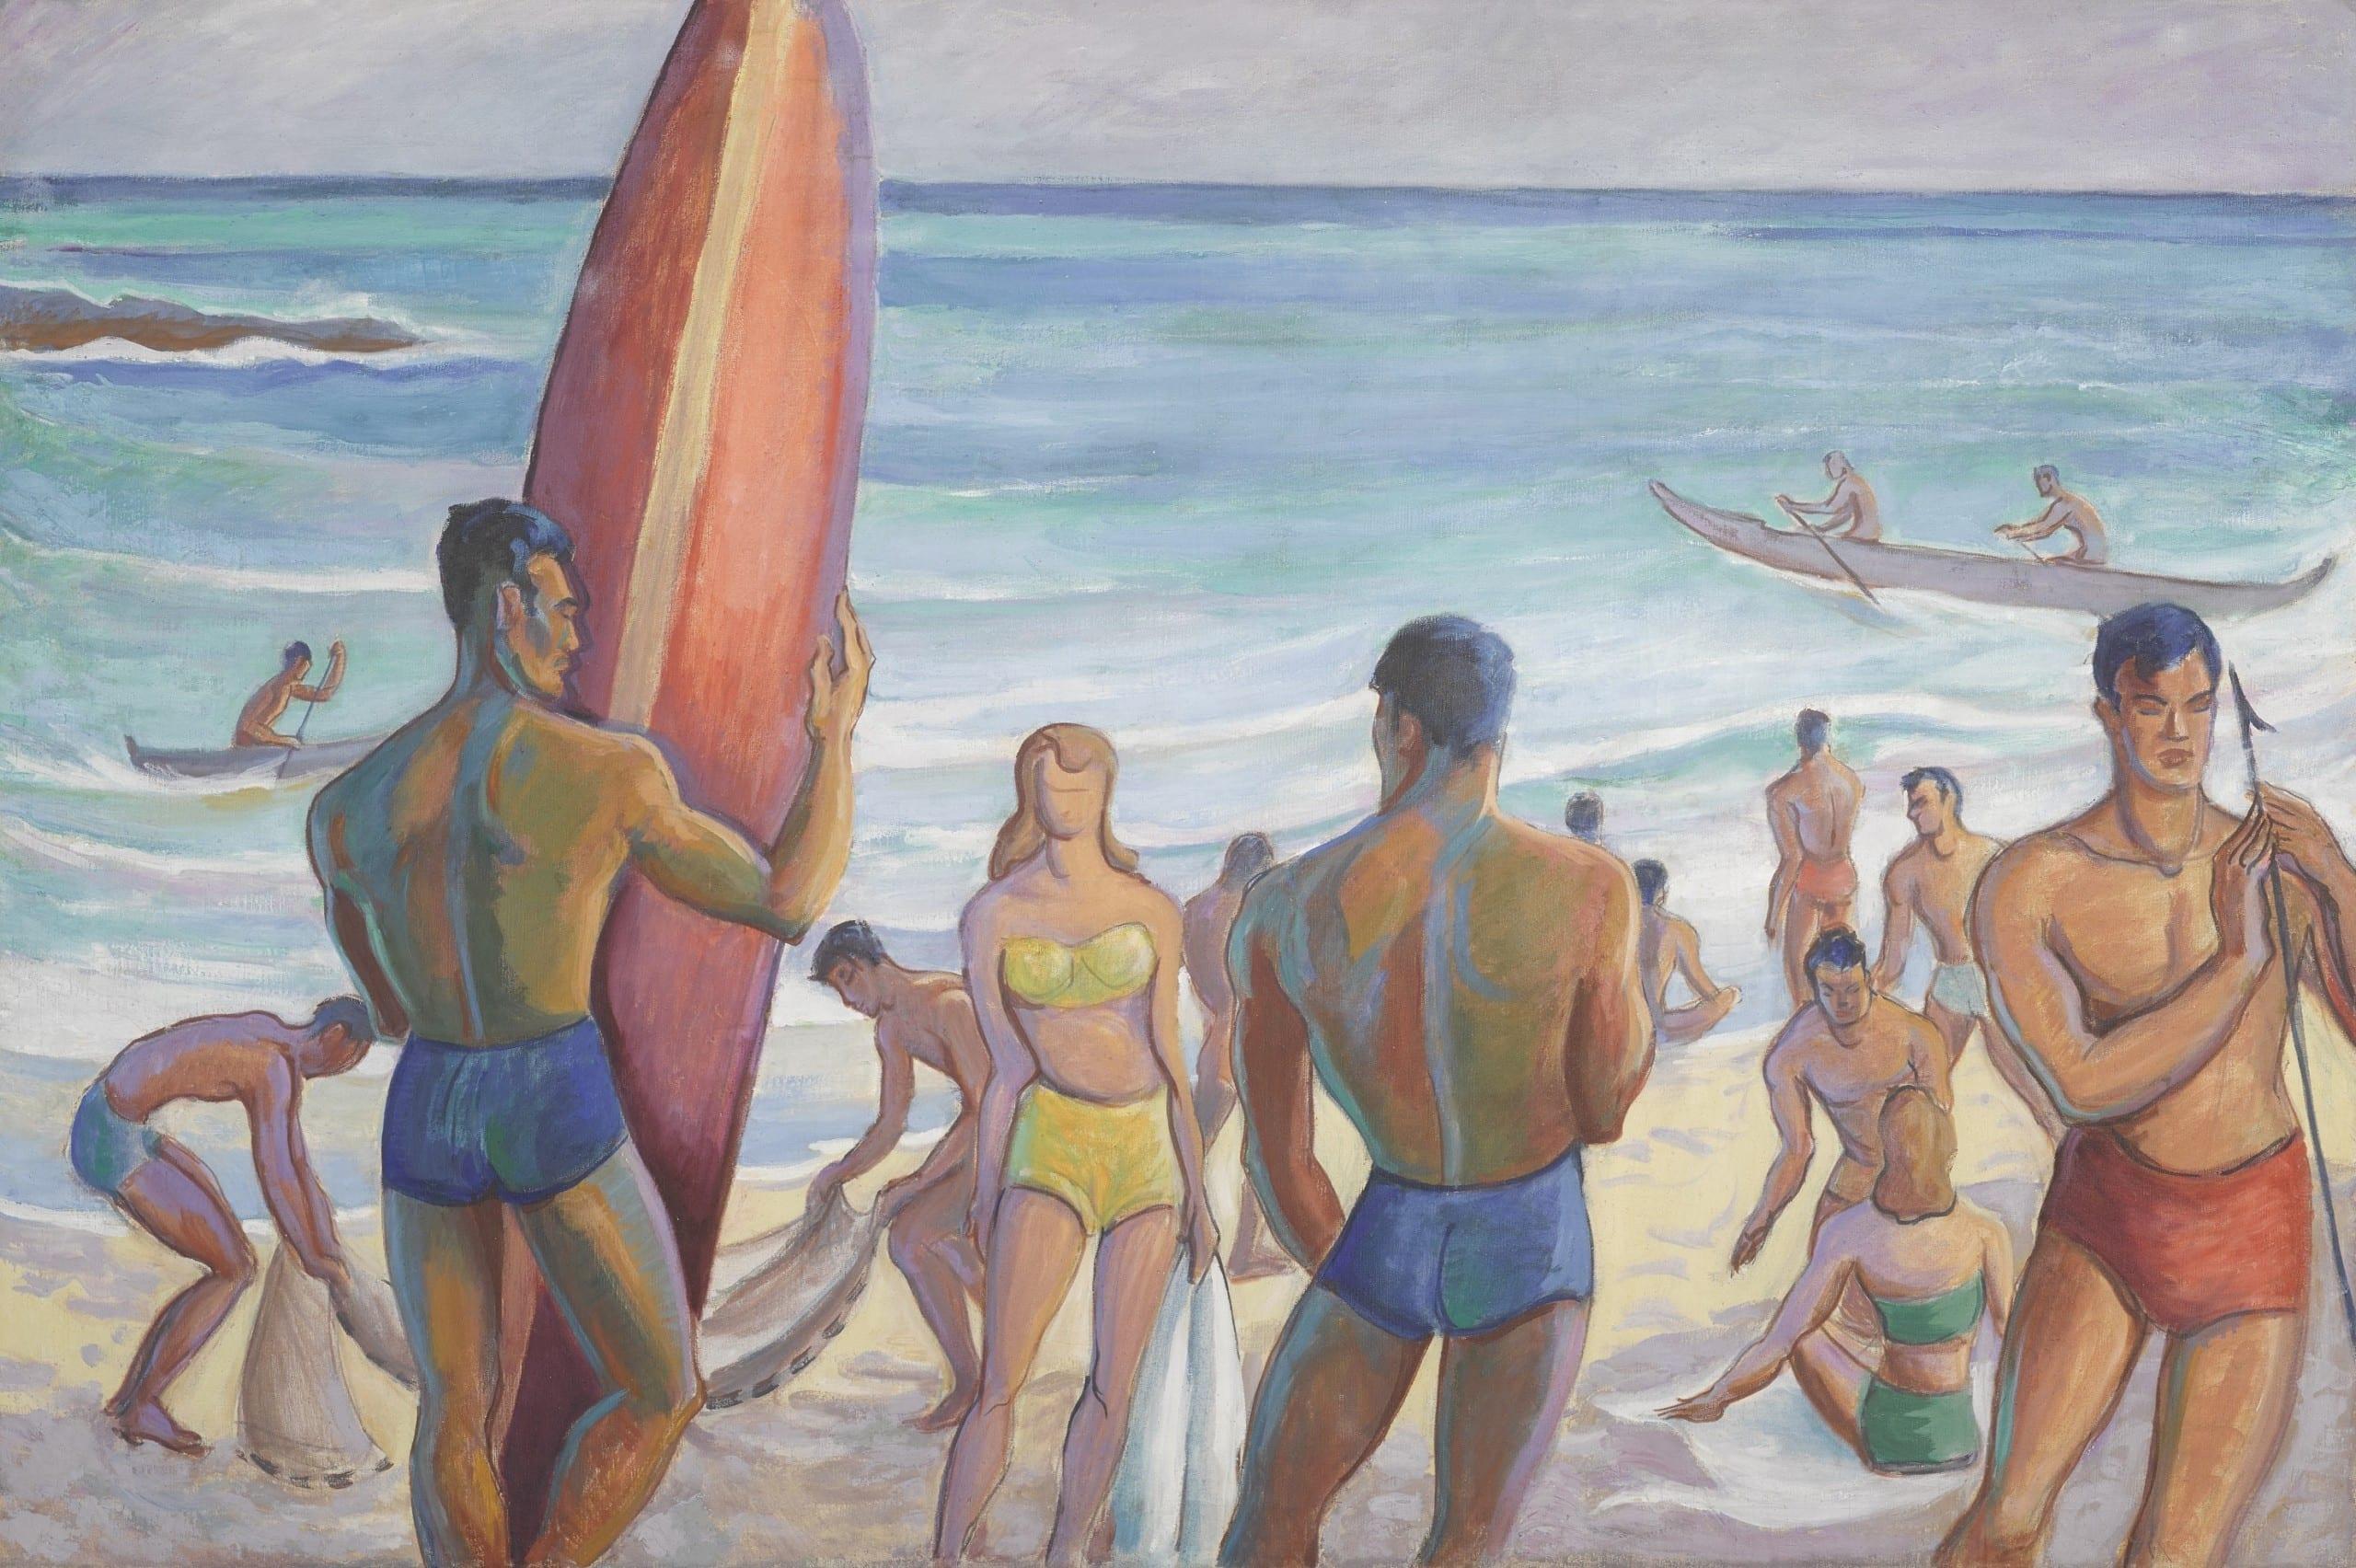 Robert Eskridge (1891-1975) Waikiki